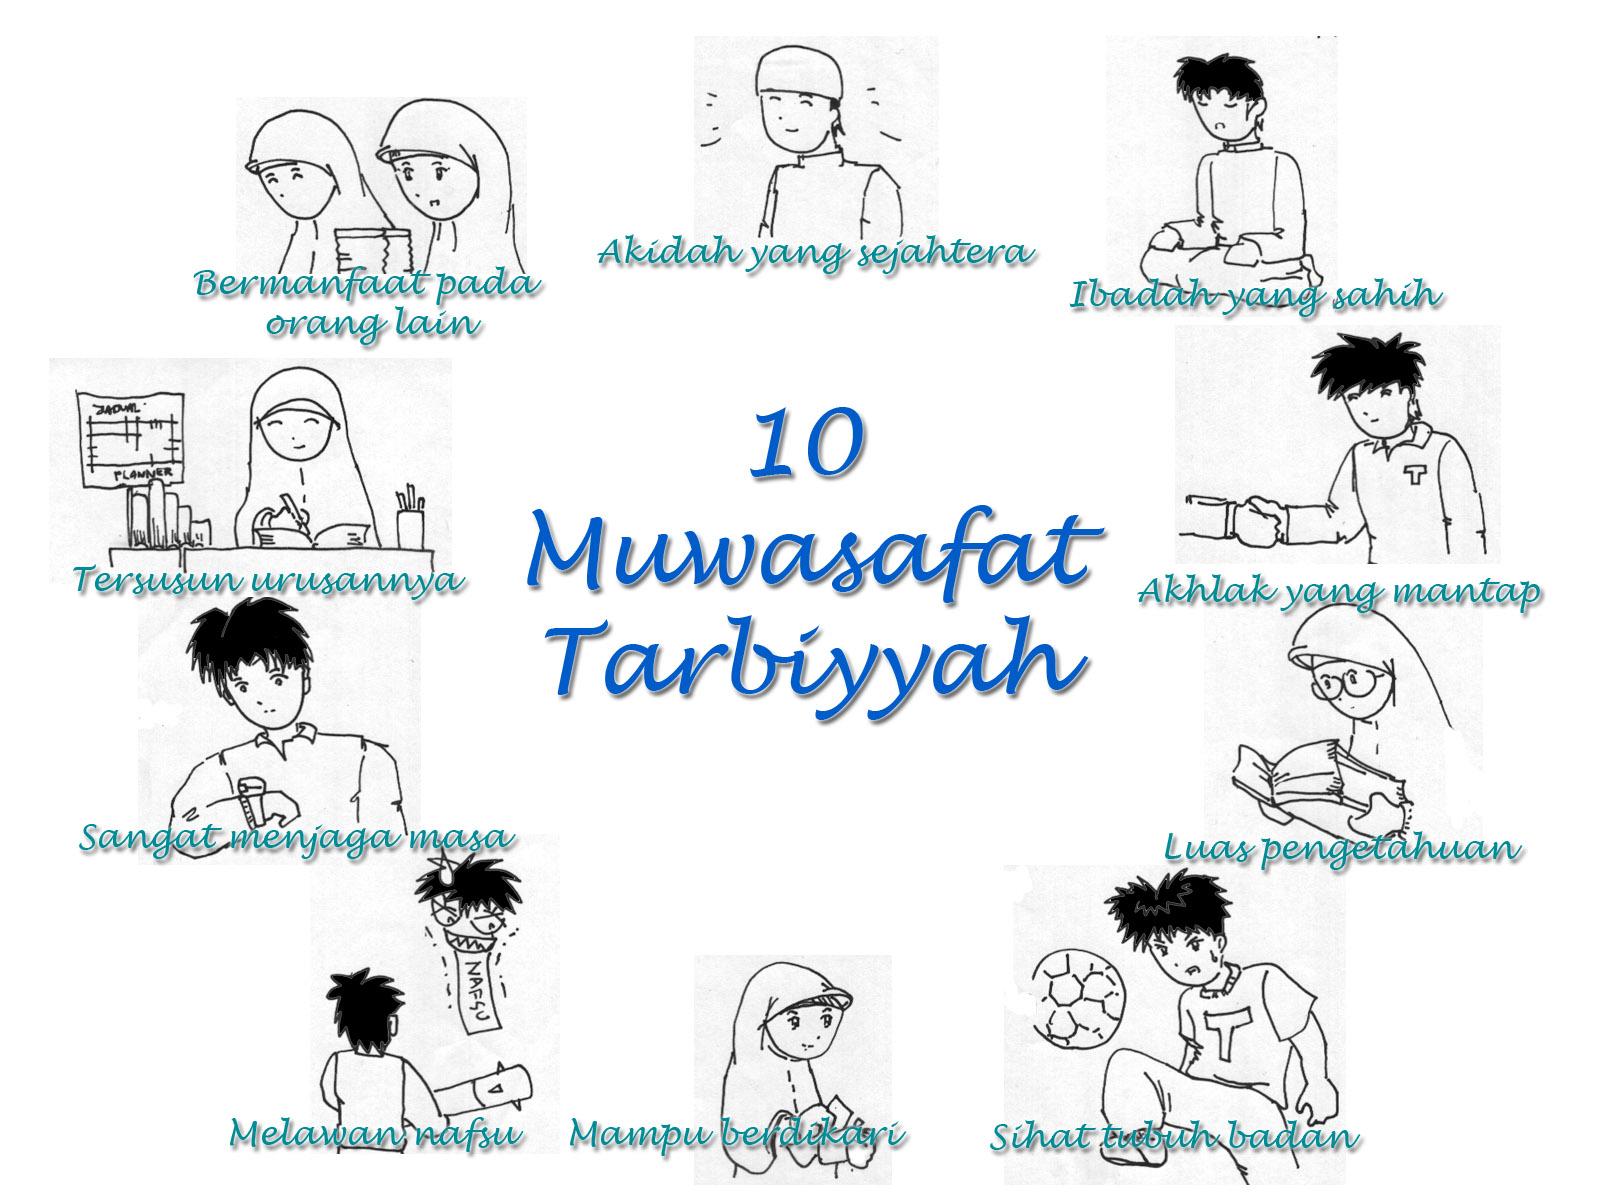 Muwashaffat Muslim